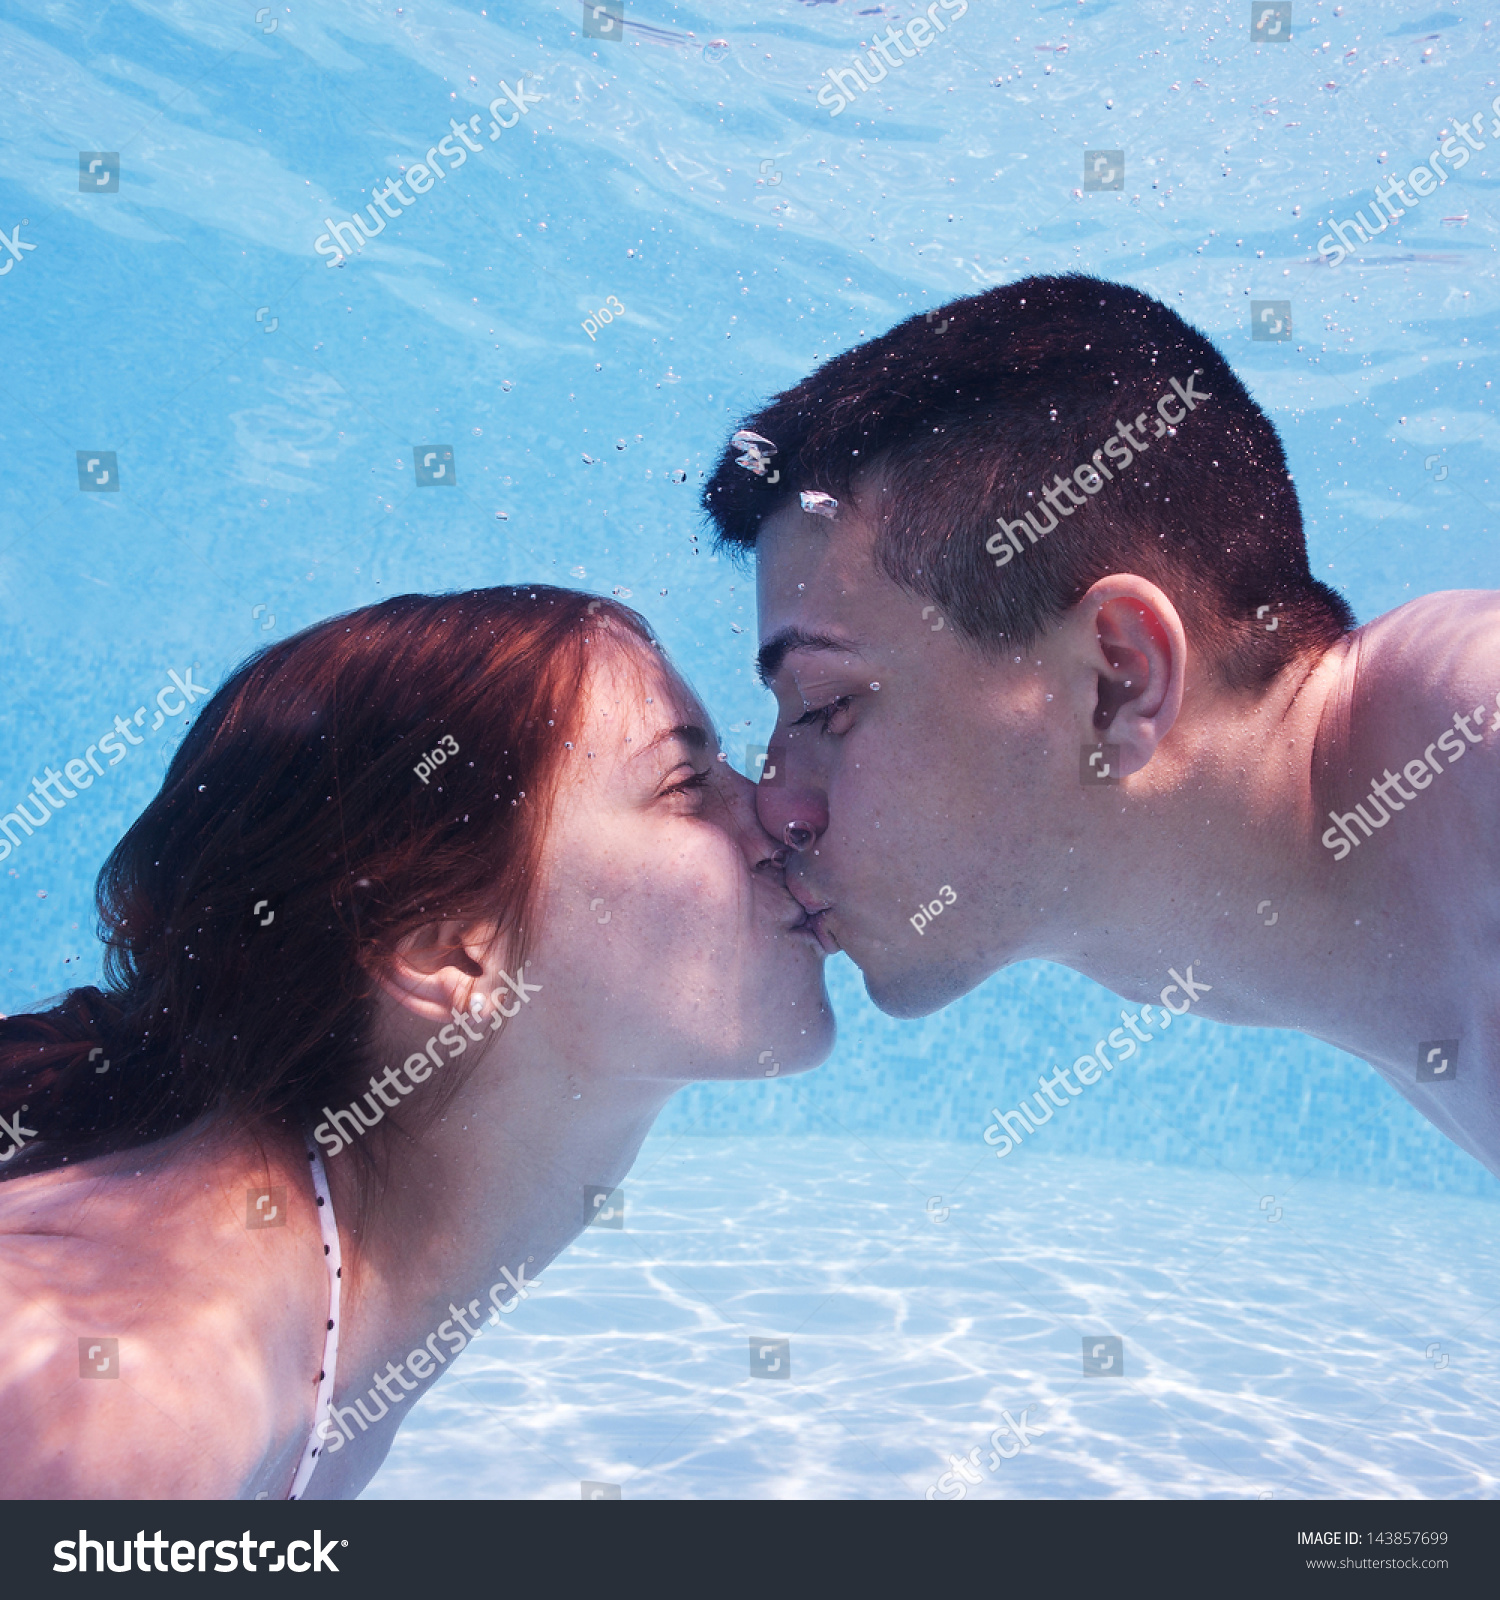 Underwater Couple Kissing Swimming Pool Stock Photo 143857699 Shutterstock